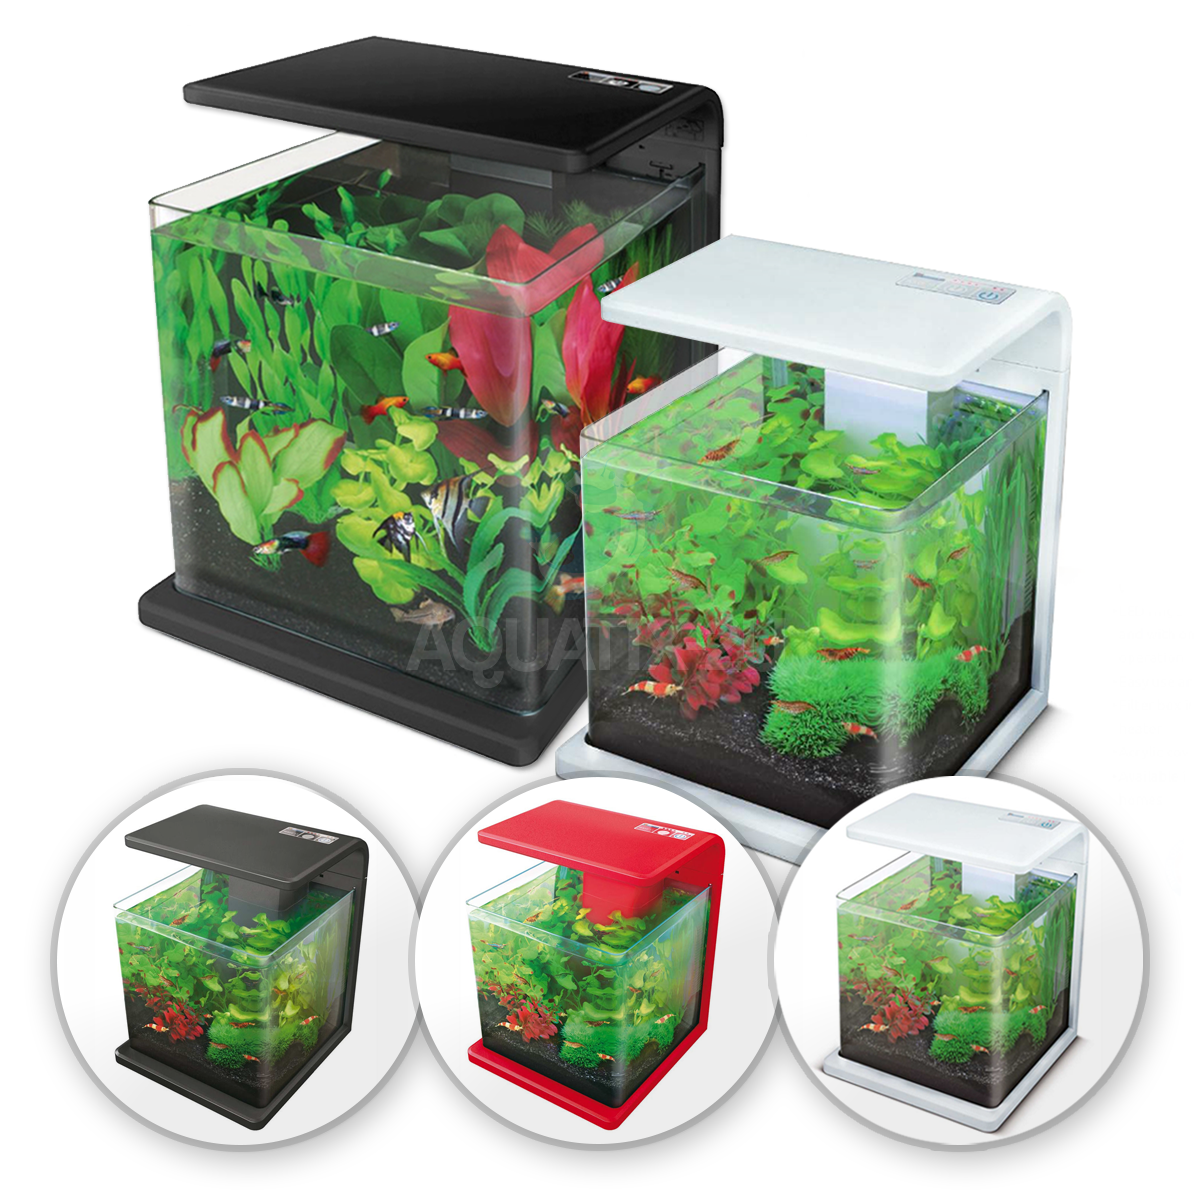 Aquarium fish tank ebay - Superfish Wave Aquarium 15l 30l Glass Fish Tank Complete With Lights And Filter